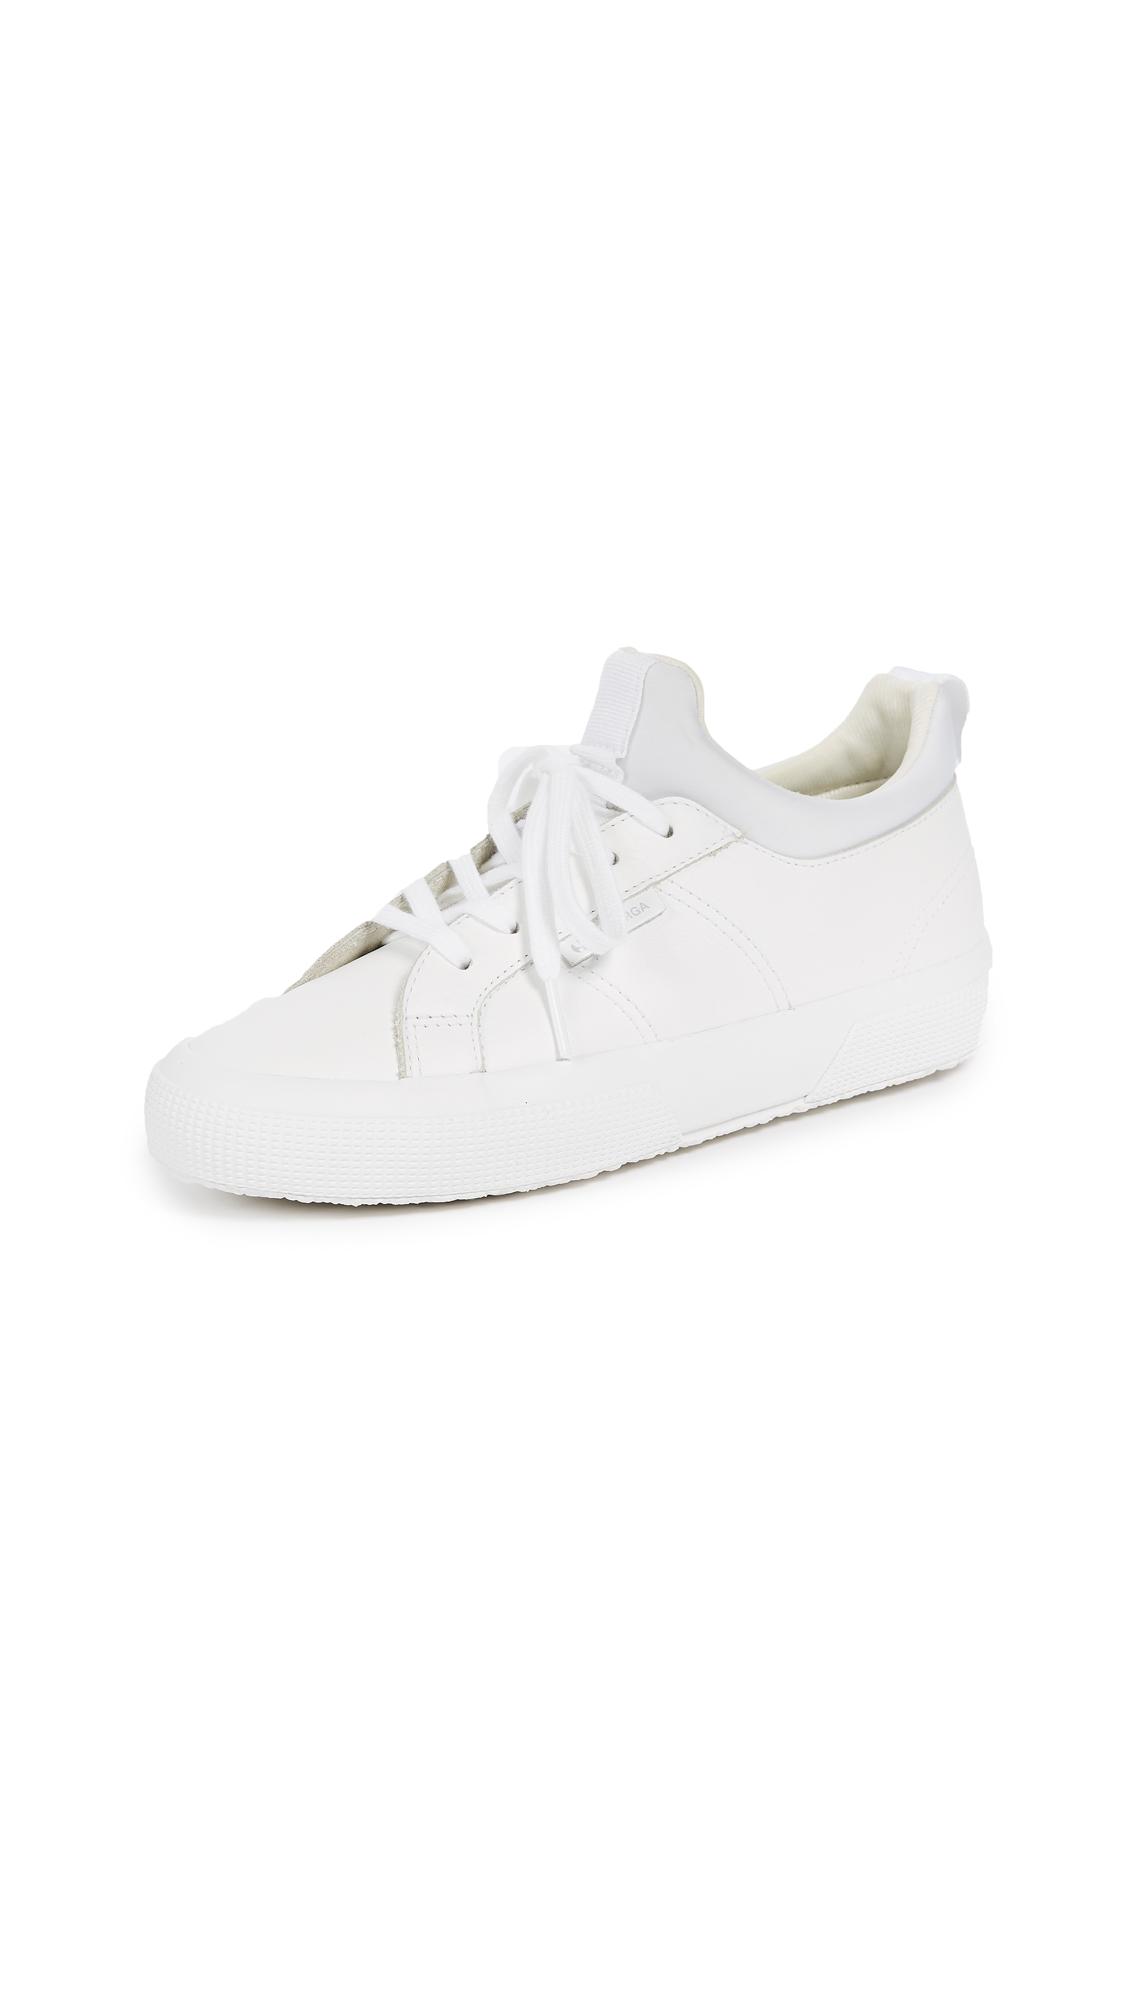 Superga 2880 Sport Sneakers - White